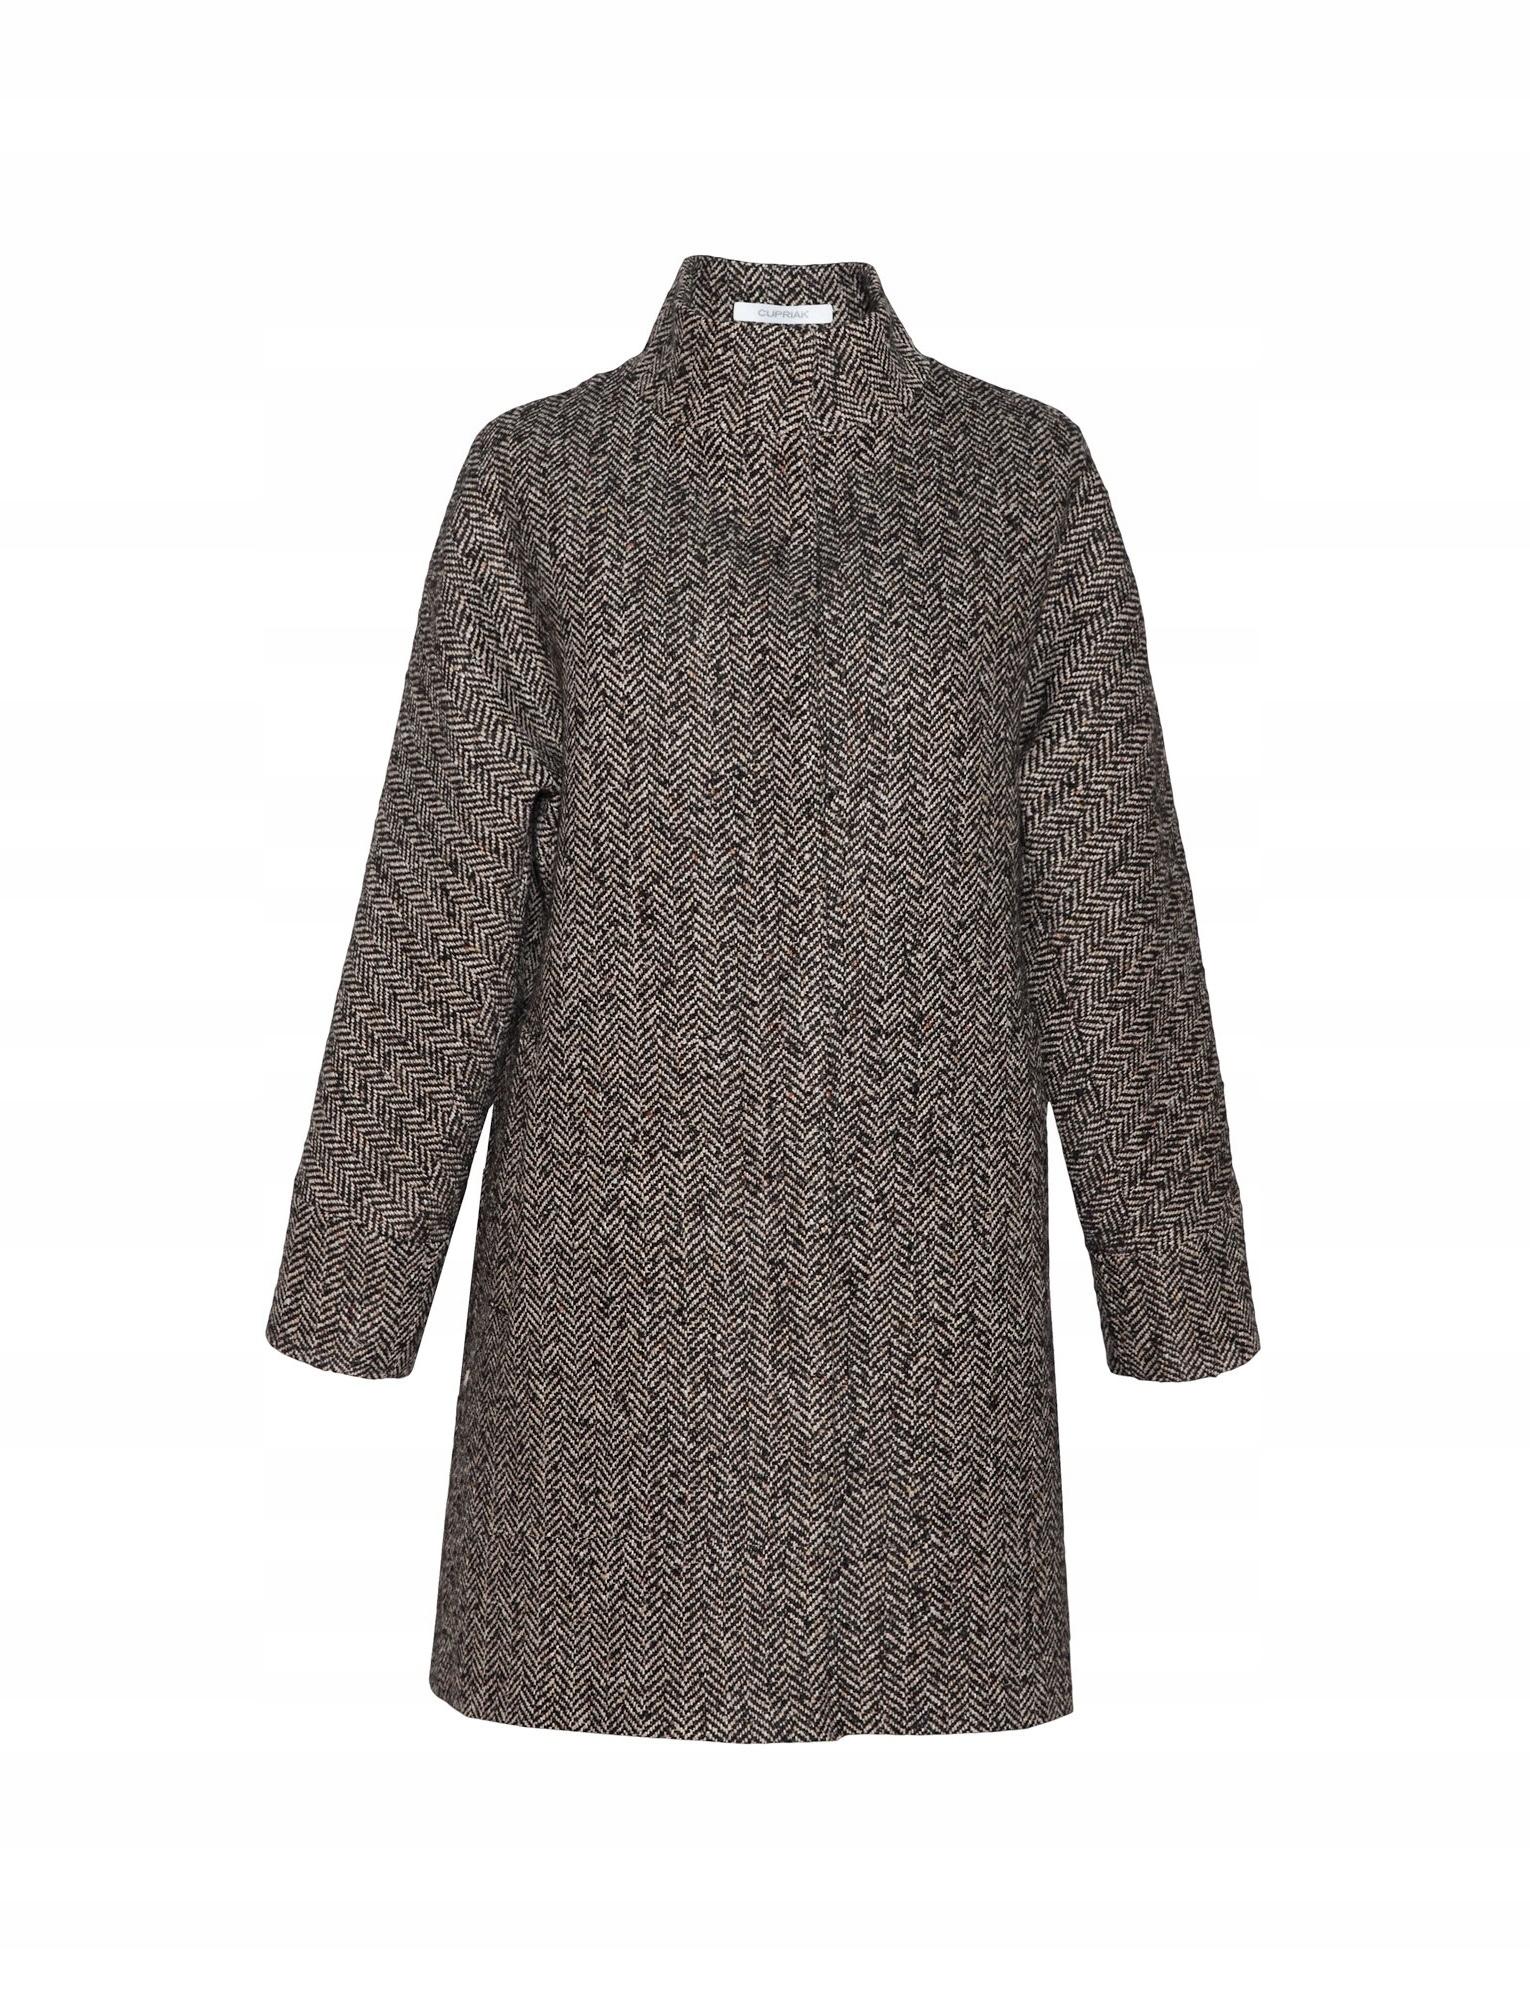 42ca20212f370 Płaszcz Beata Cupriak, - 40% ceny, m. trendi, r. M - 7617889854 ...